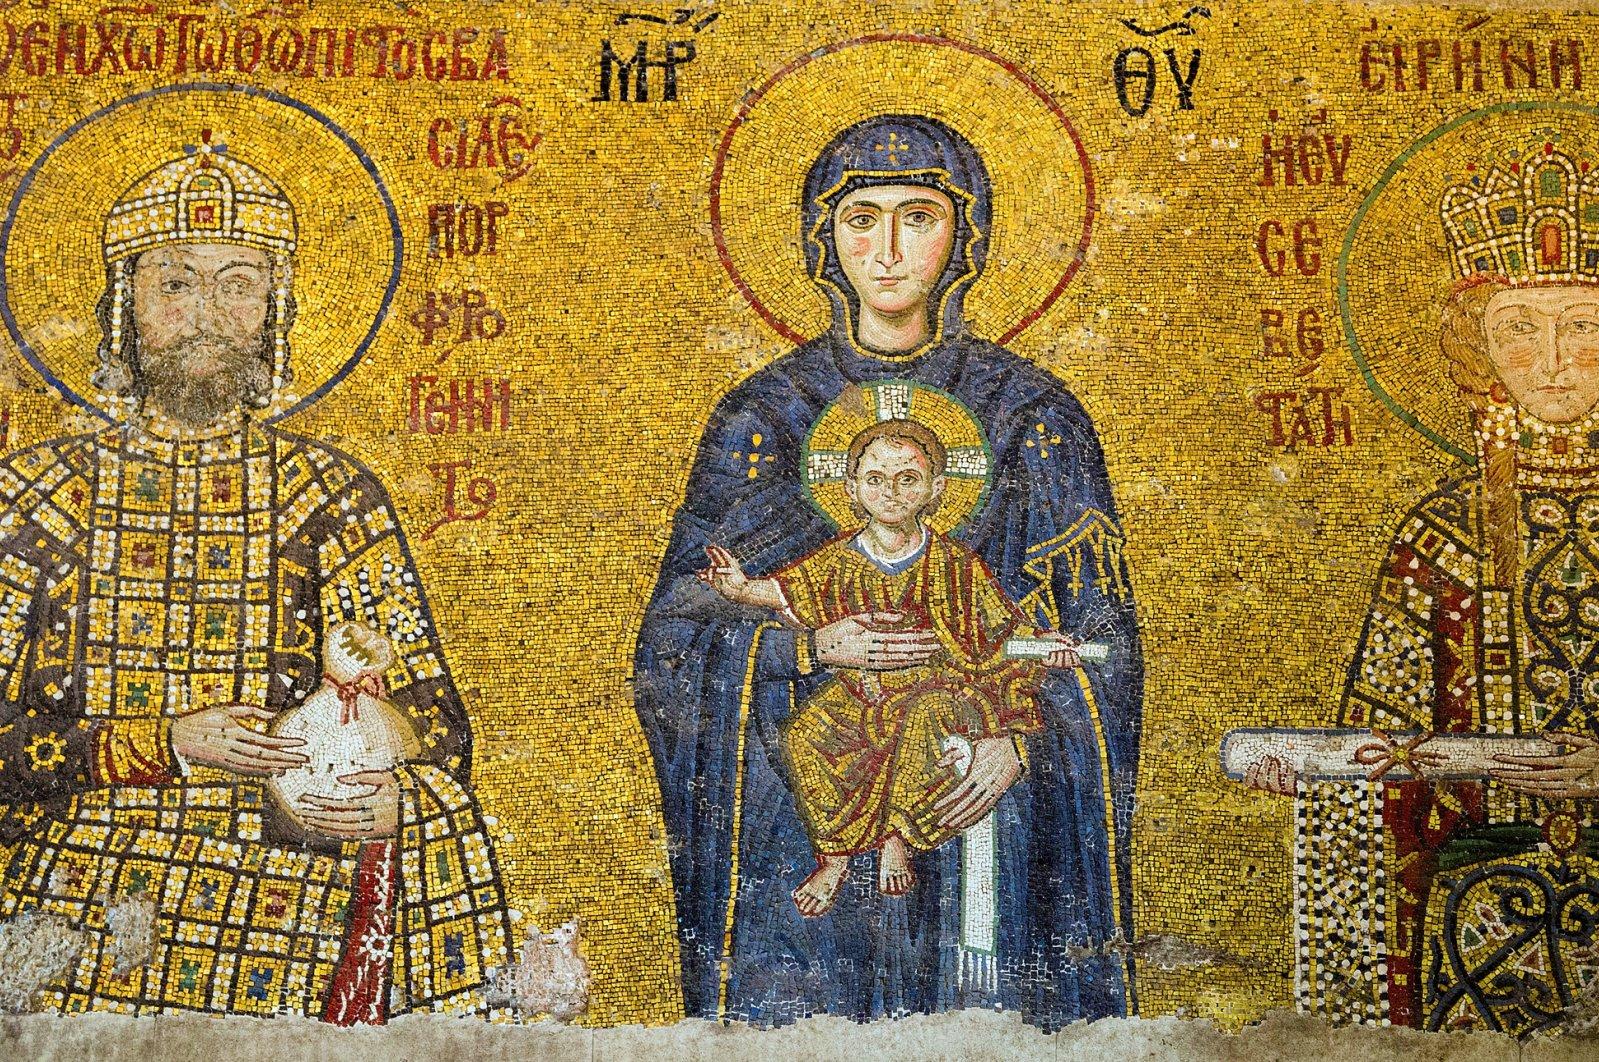 Christian mosaic icon in the Hagia Sofia. (iStock Photo)